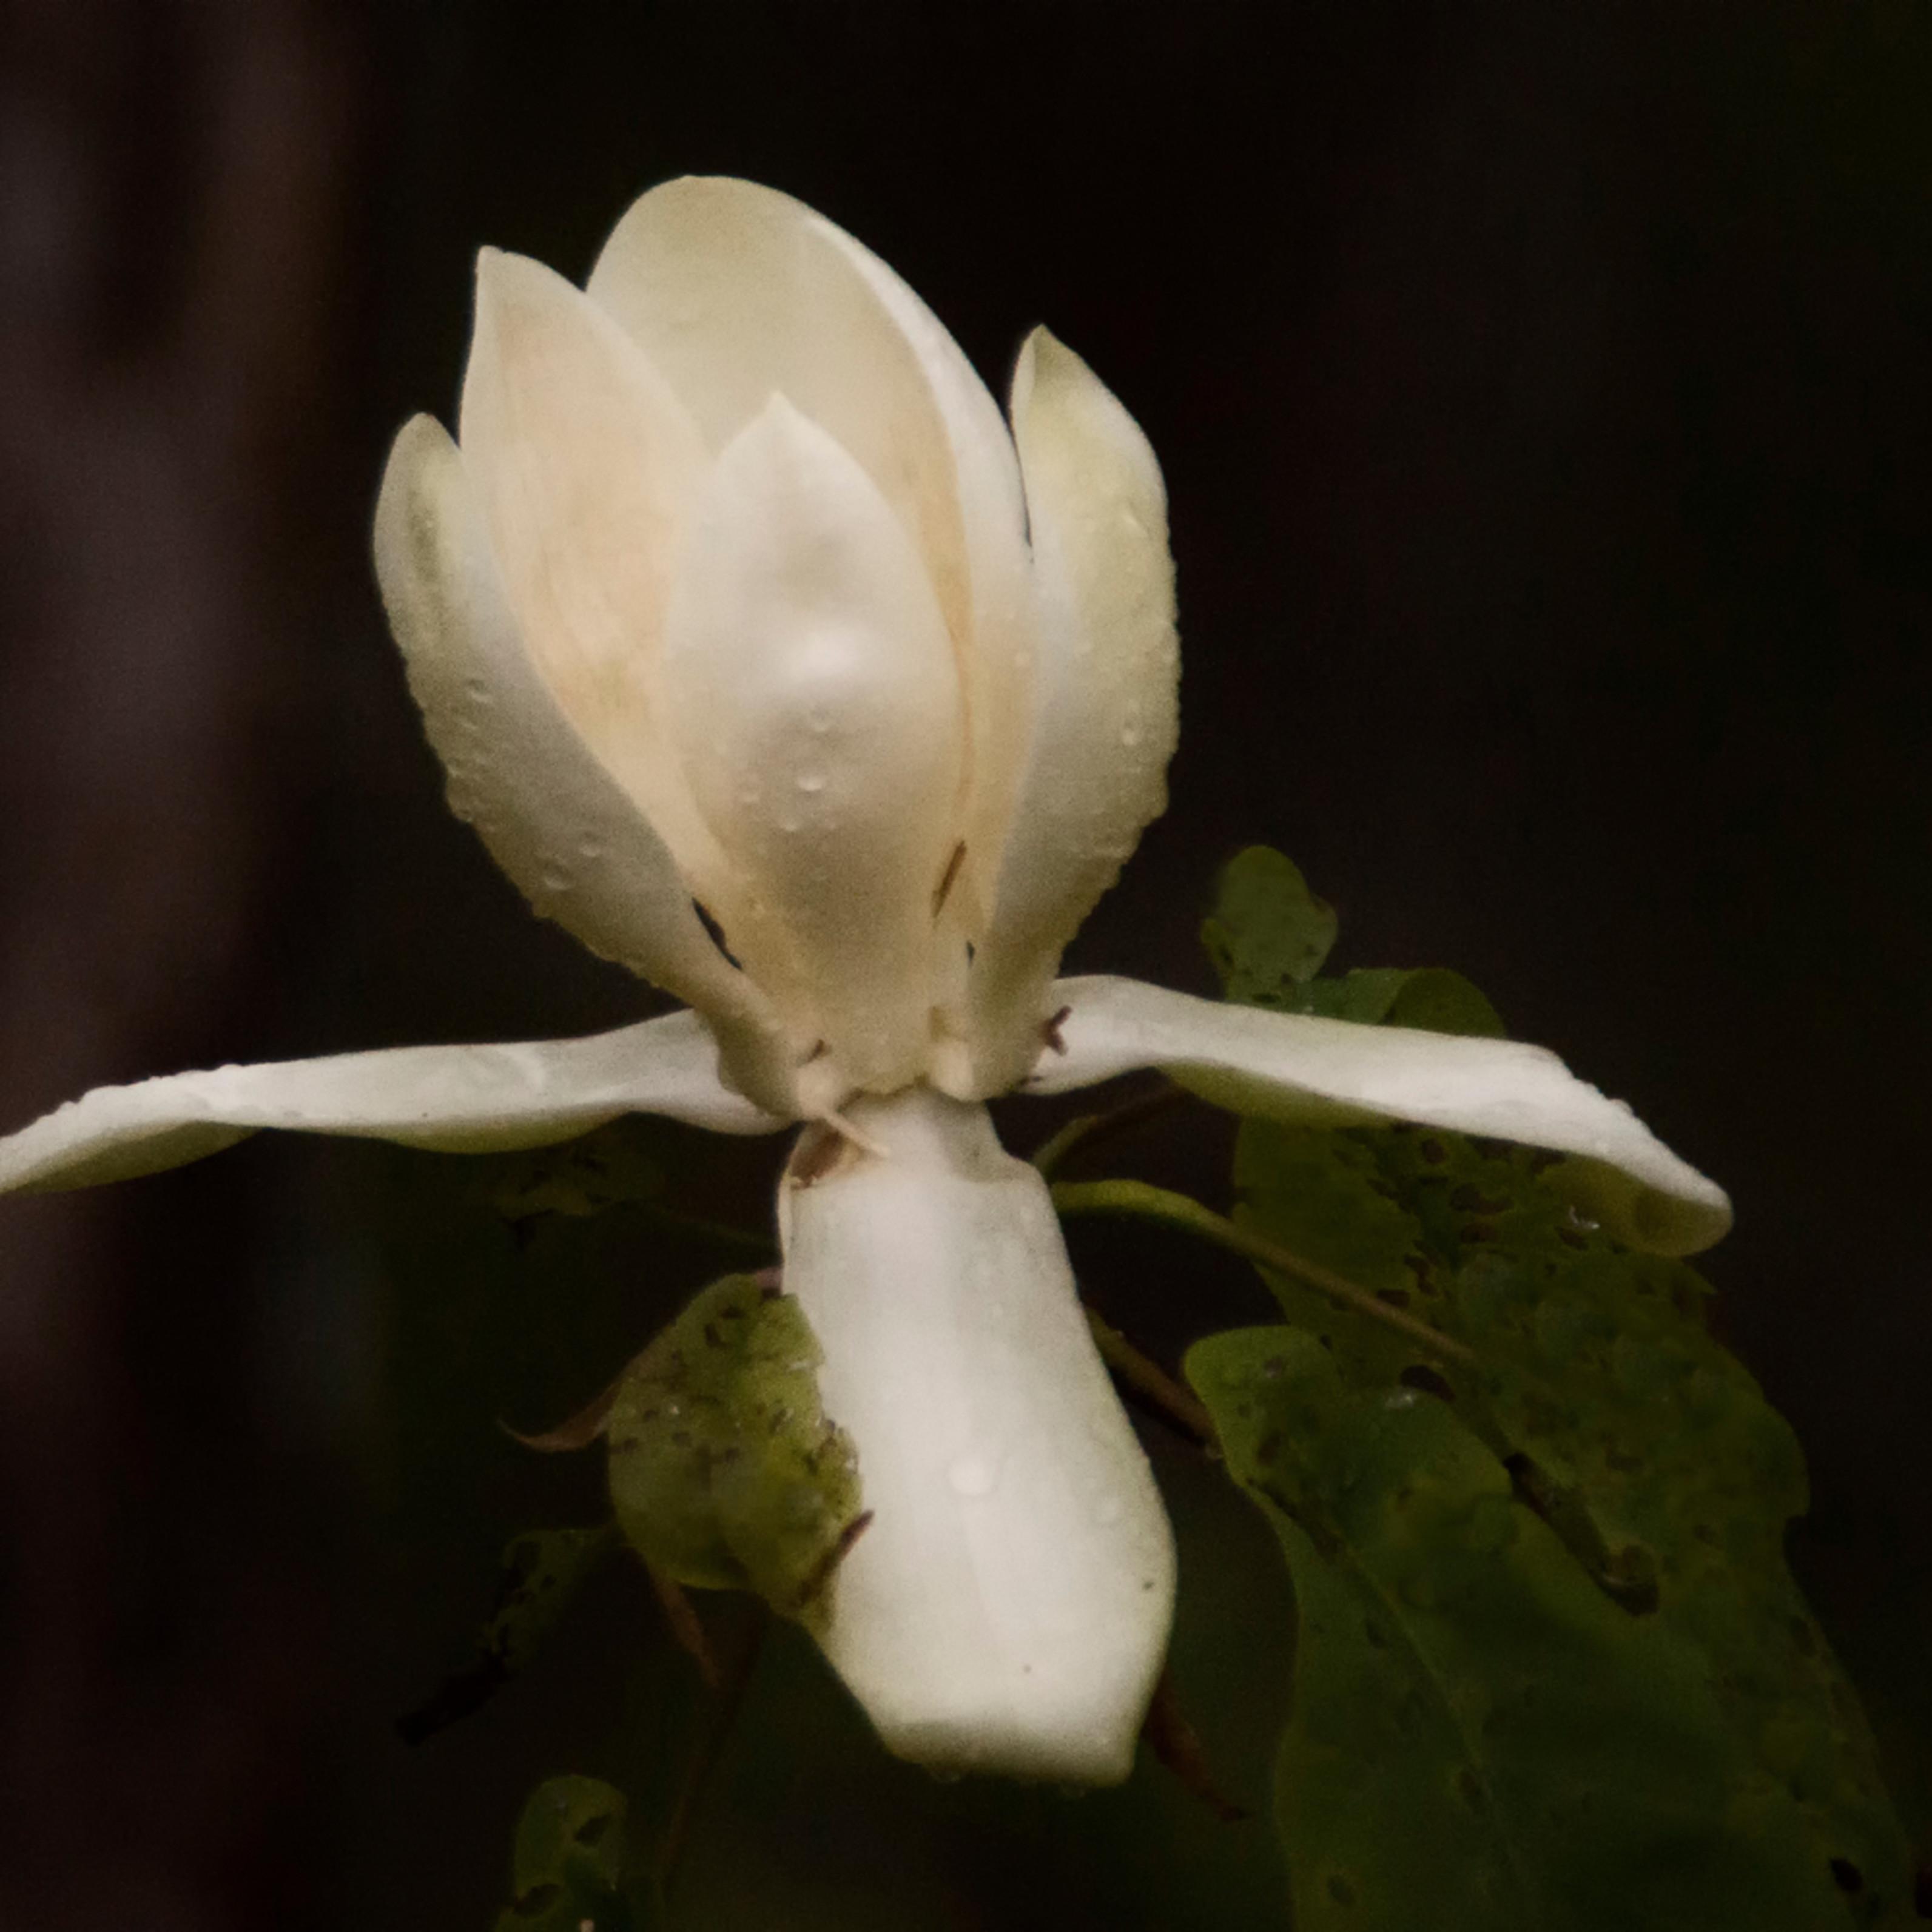 Magnolia1 jkbrca